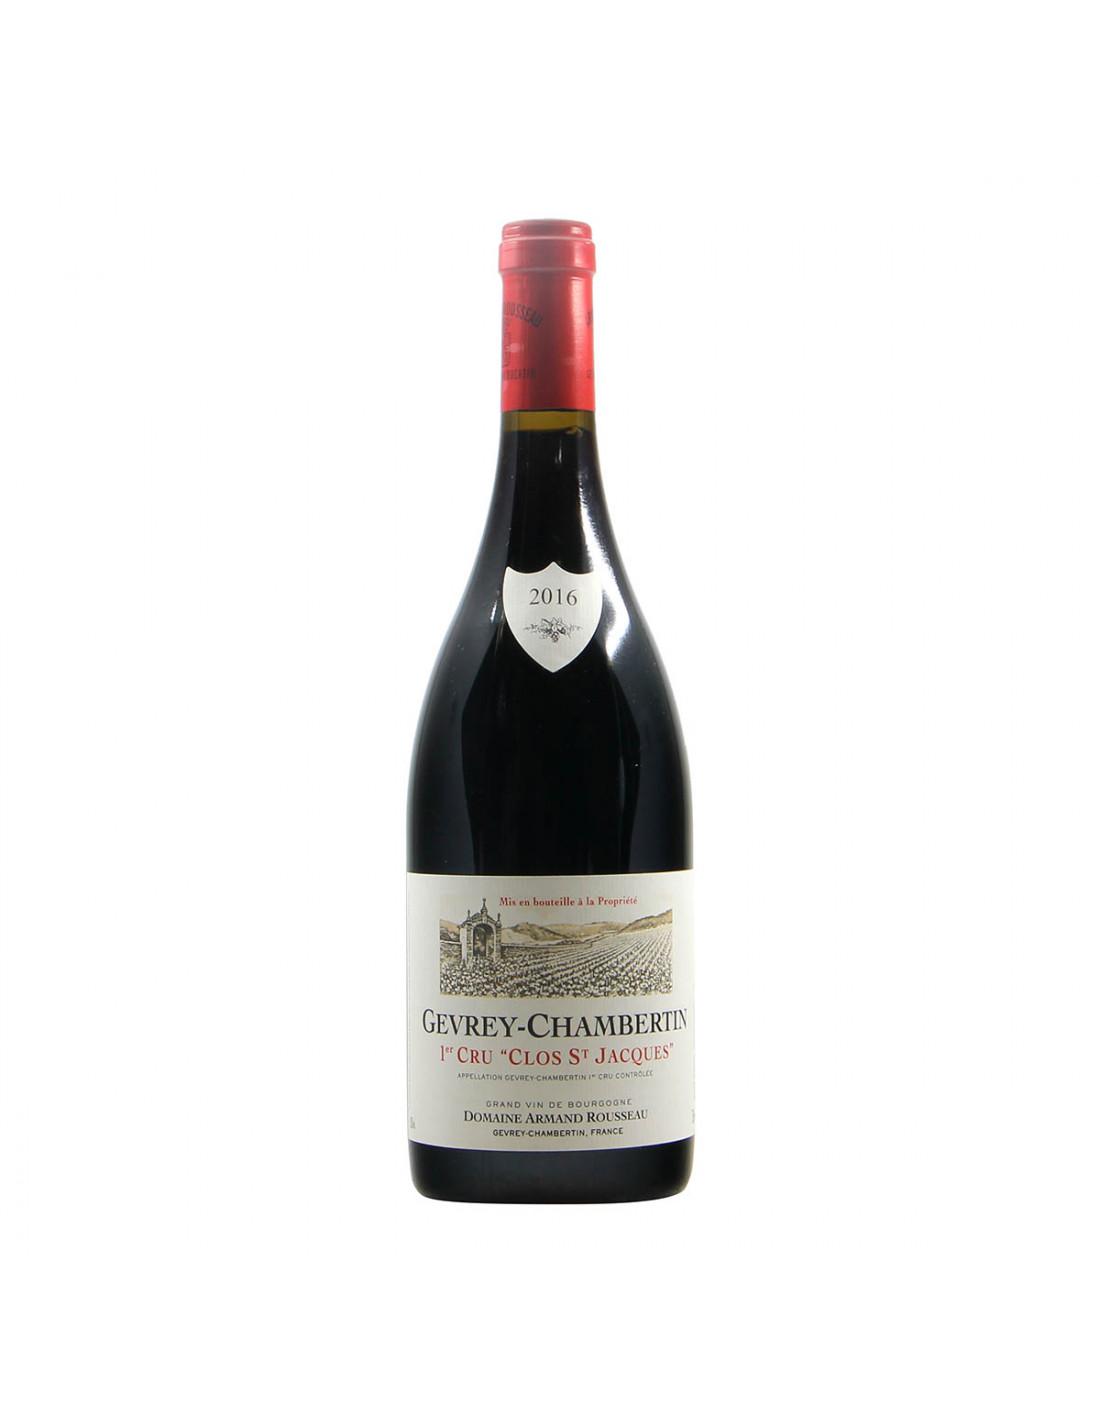 Armand Rousseau Gevrey-Chambertin qer Cru Clos St Jacques 2016 Grandi Bottiglie